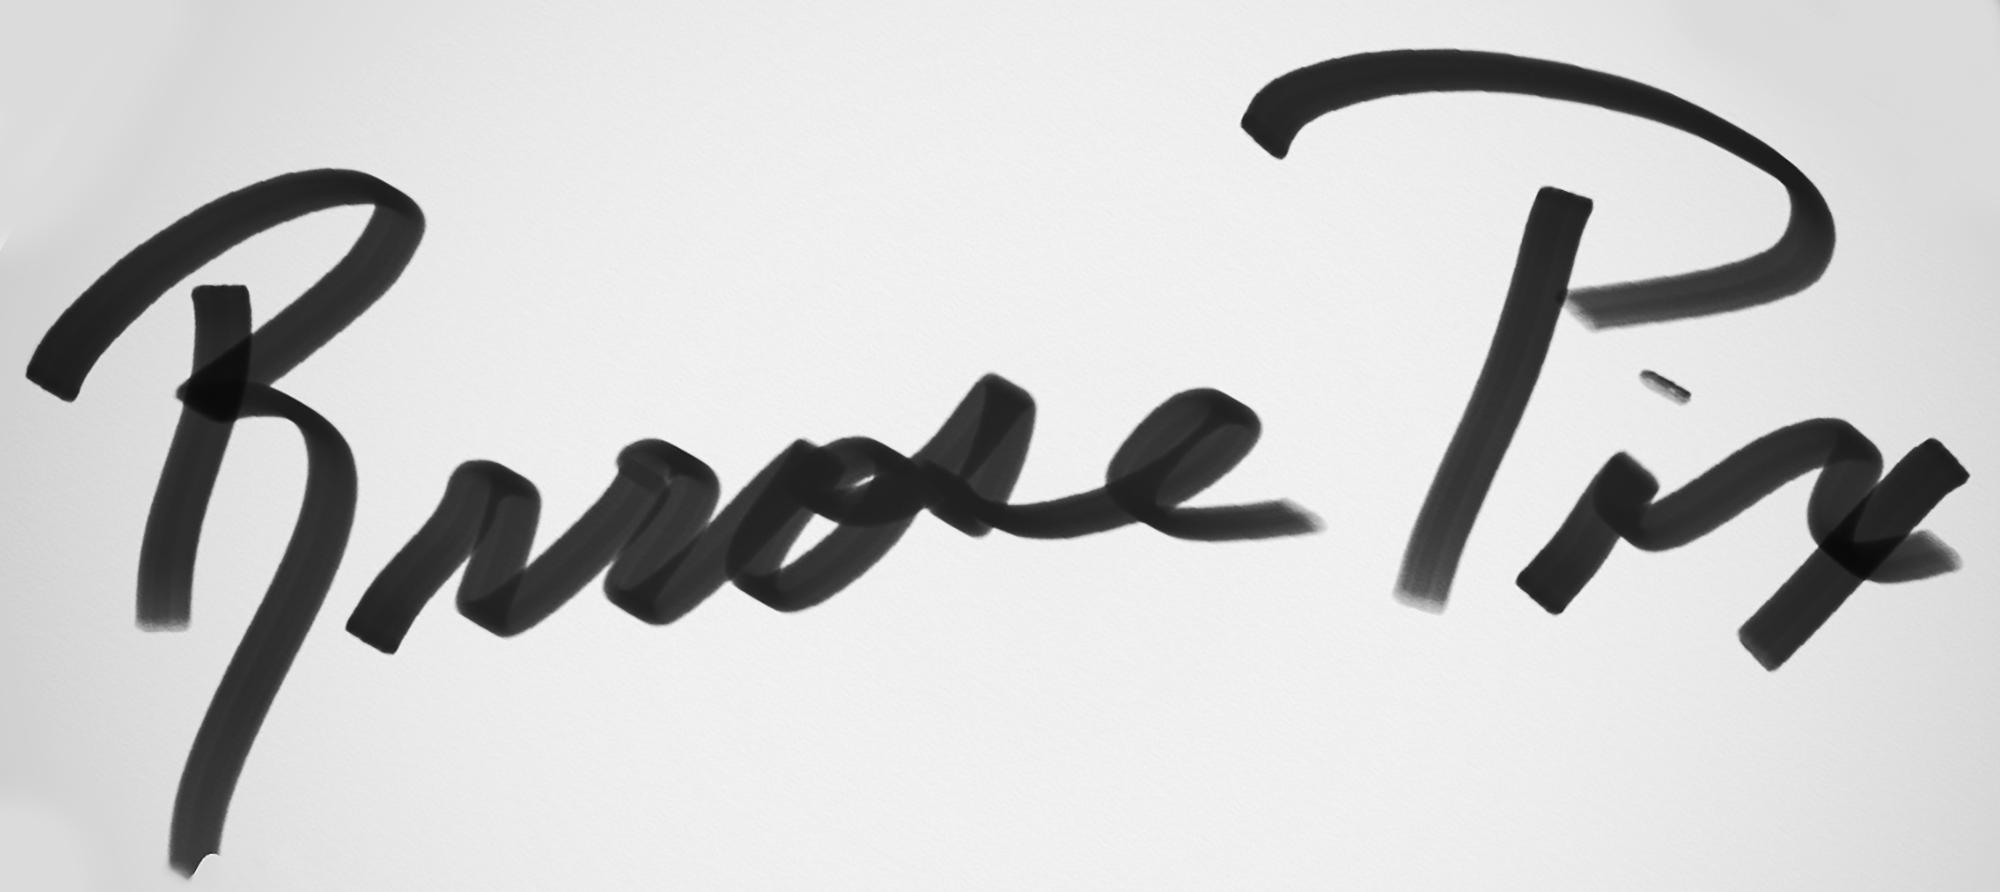 rrrosepix's Signature